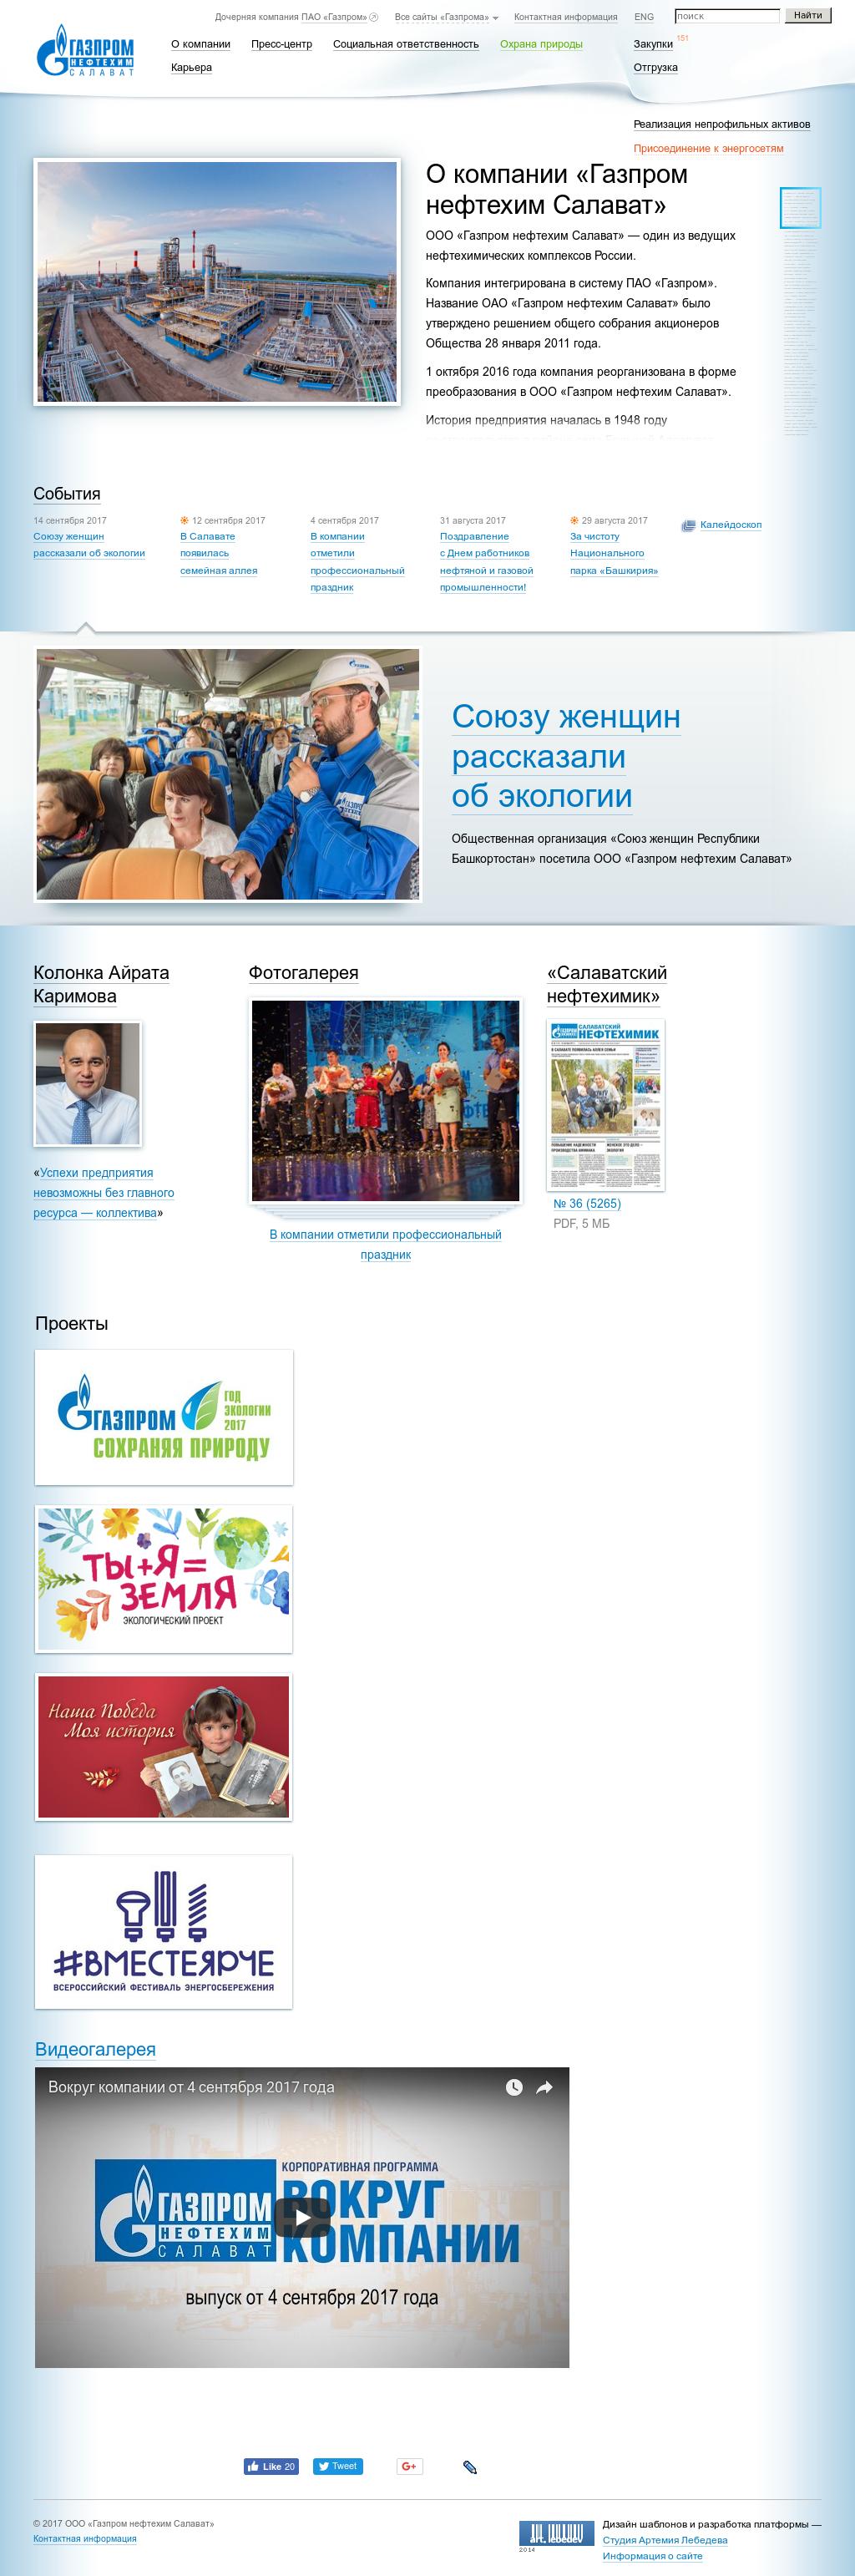 JSC Gazprom neftekhim Salavat 32